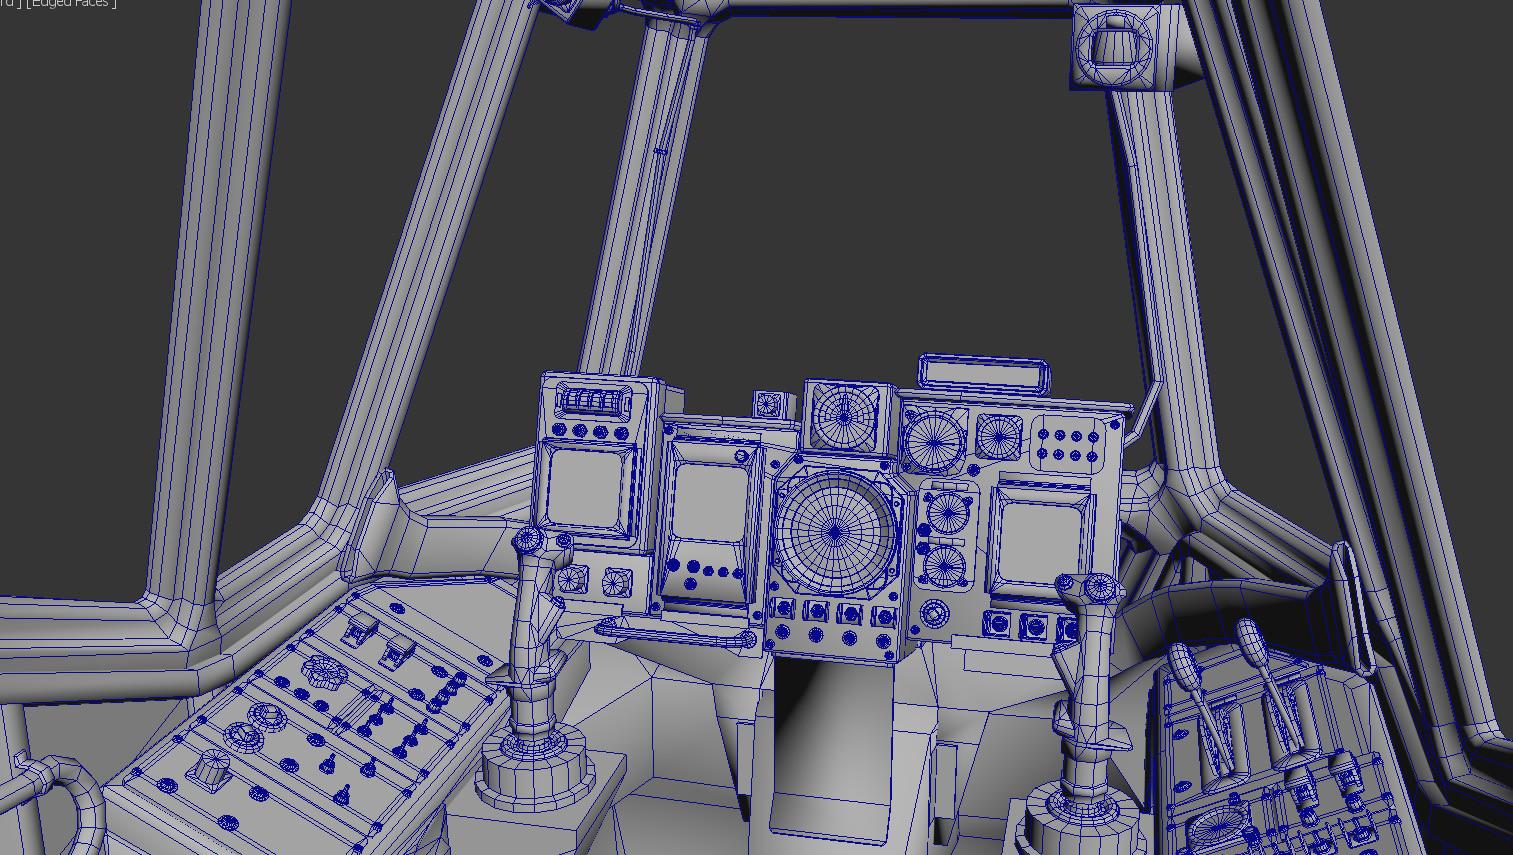 Mech Cockpit Wire